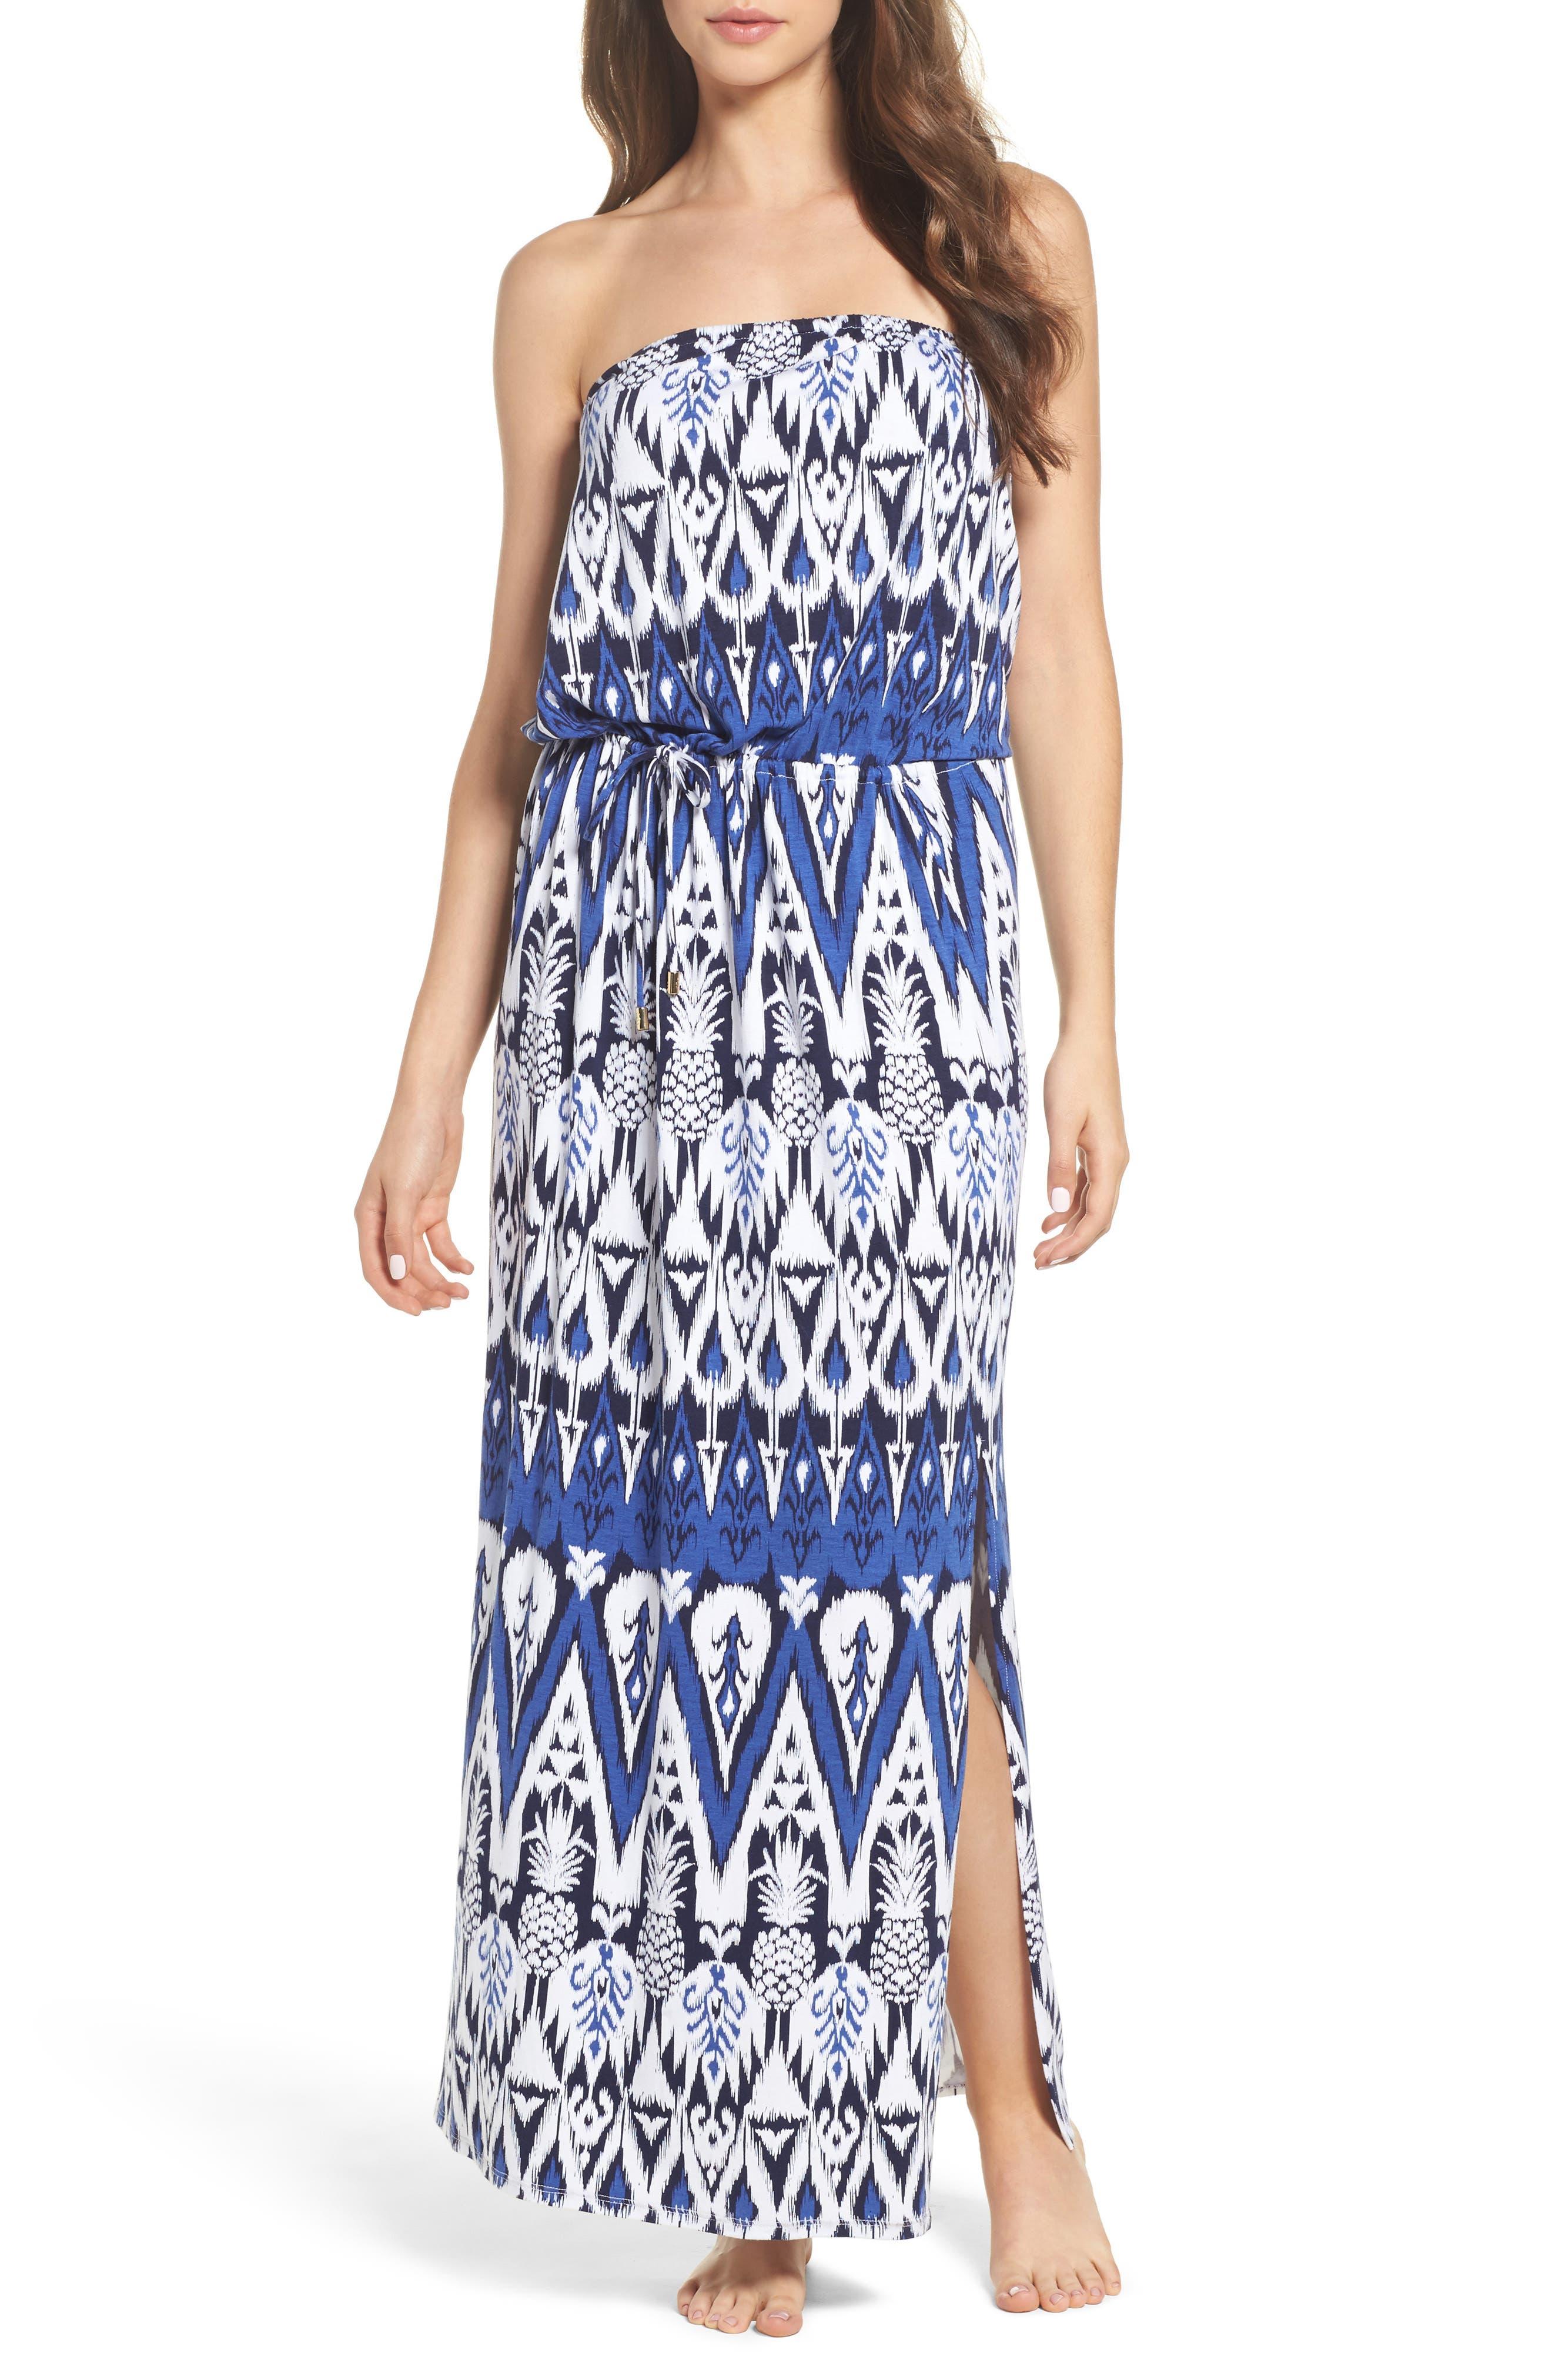 Main Image - Tommy Bahama Pineapple Ikat Cover-Up Bandeau Maxi Dress